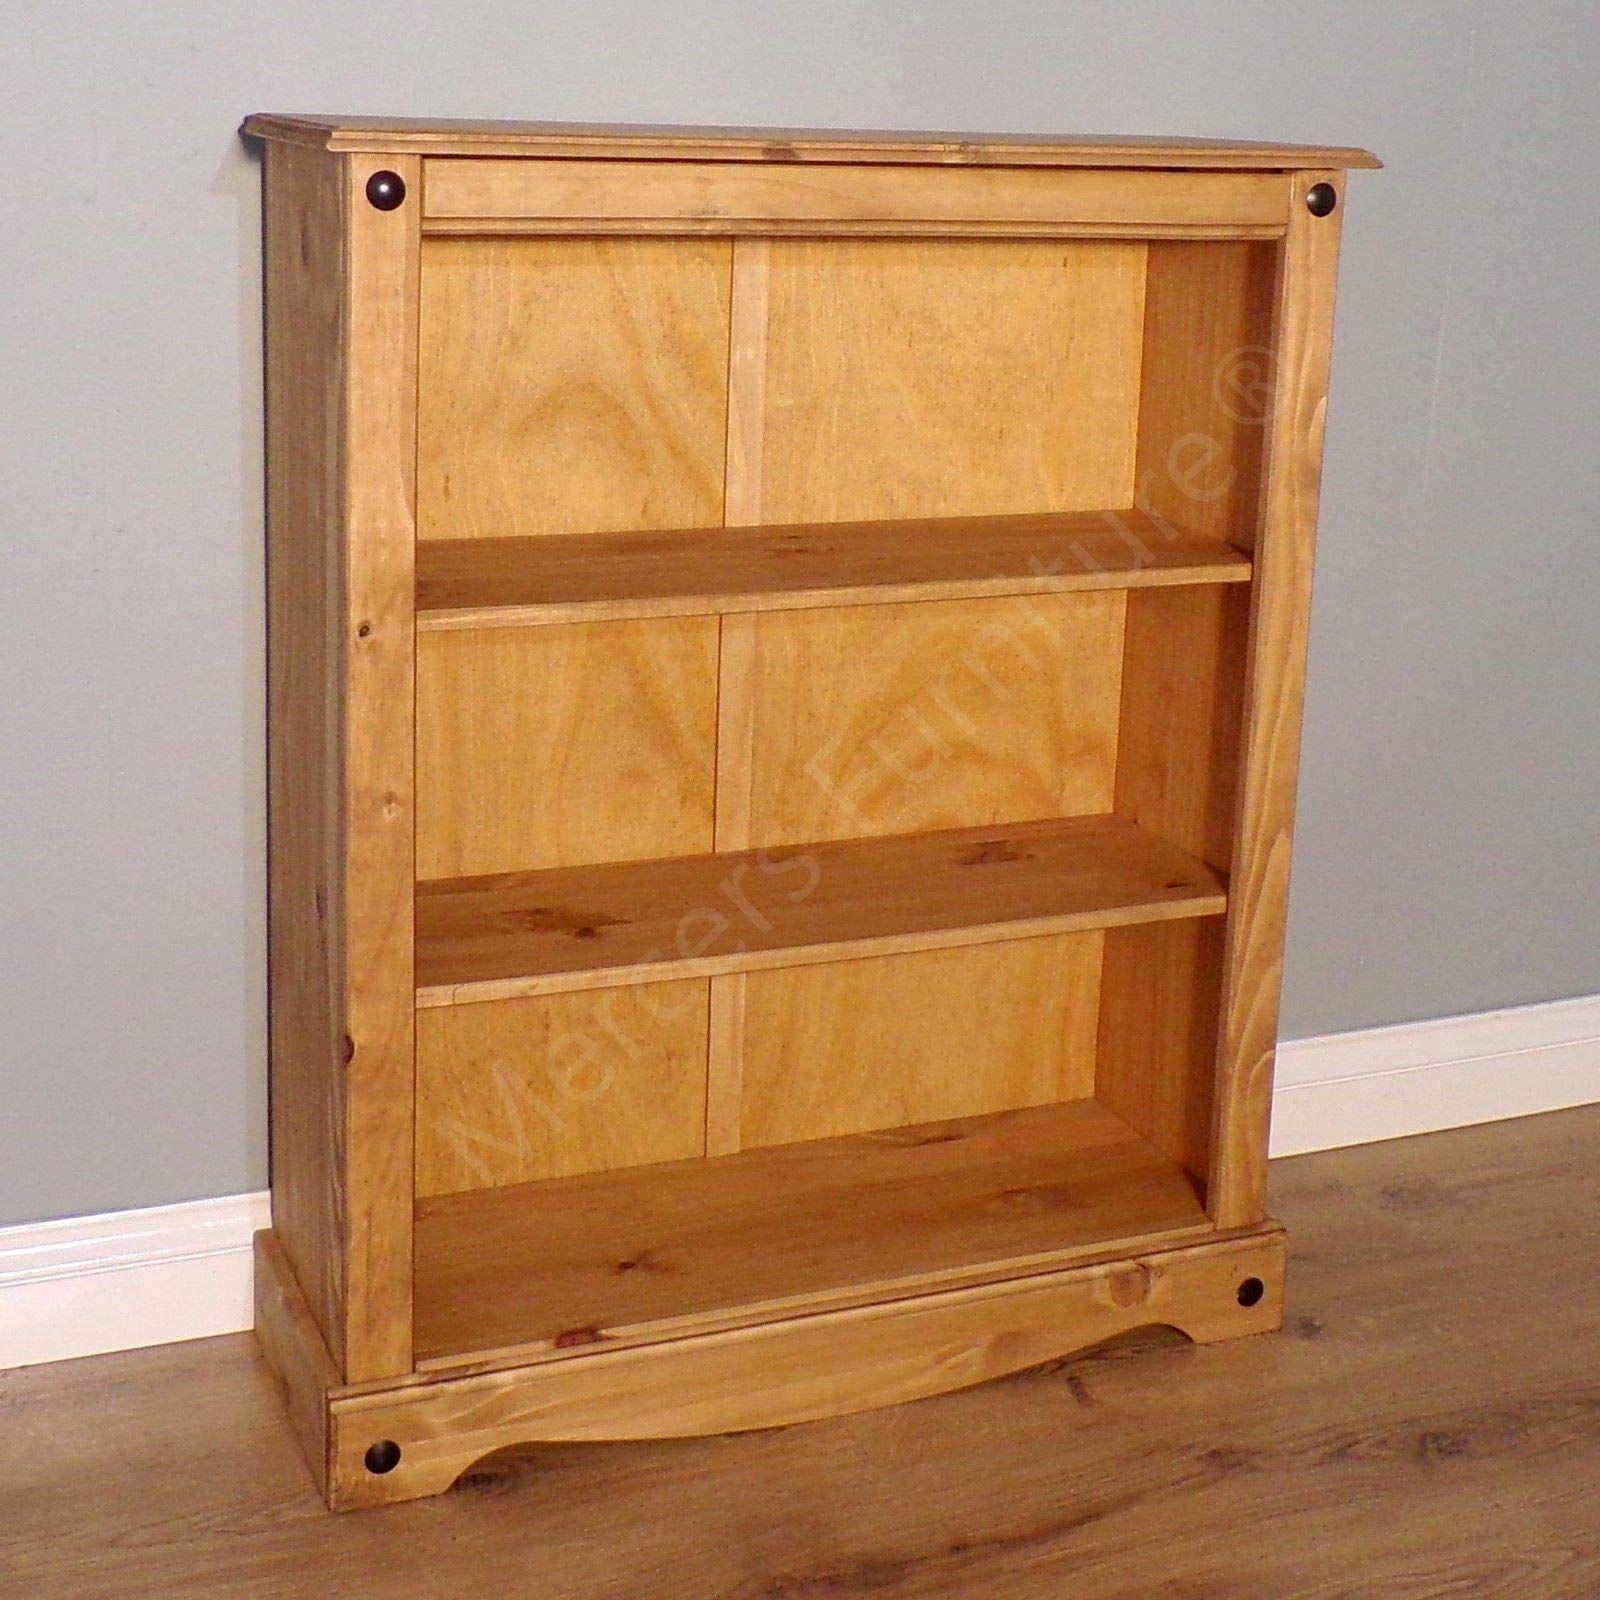 Mercers Furniture Corona Kleines B Cherregal Holz Antique Wax 84 X 29 X 100 Cm In 2020 Antique Wax Furniture Decor